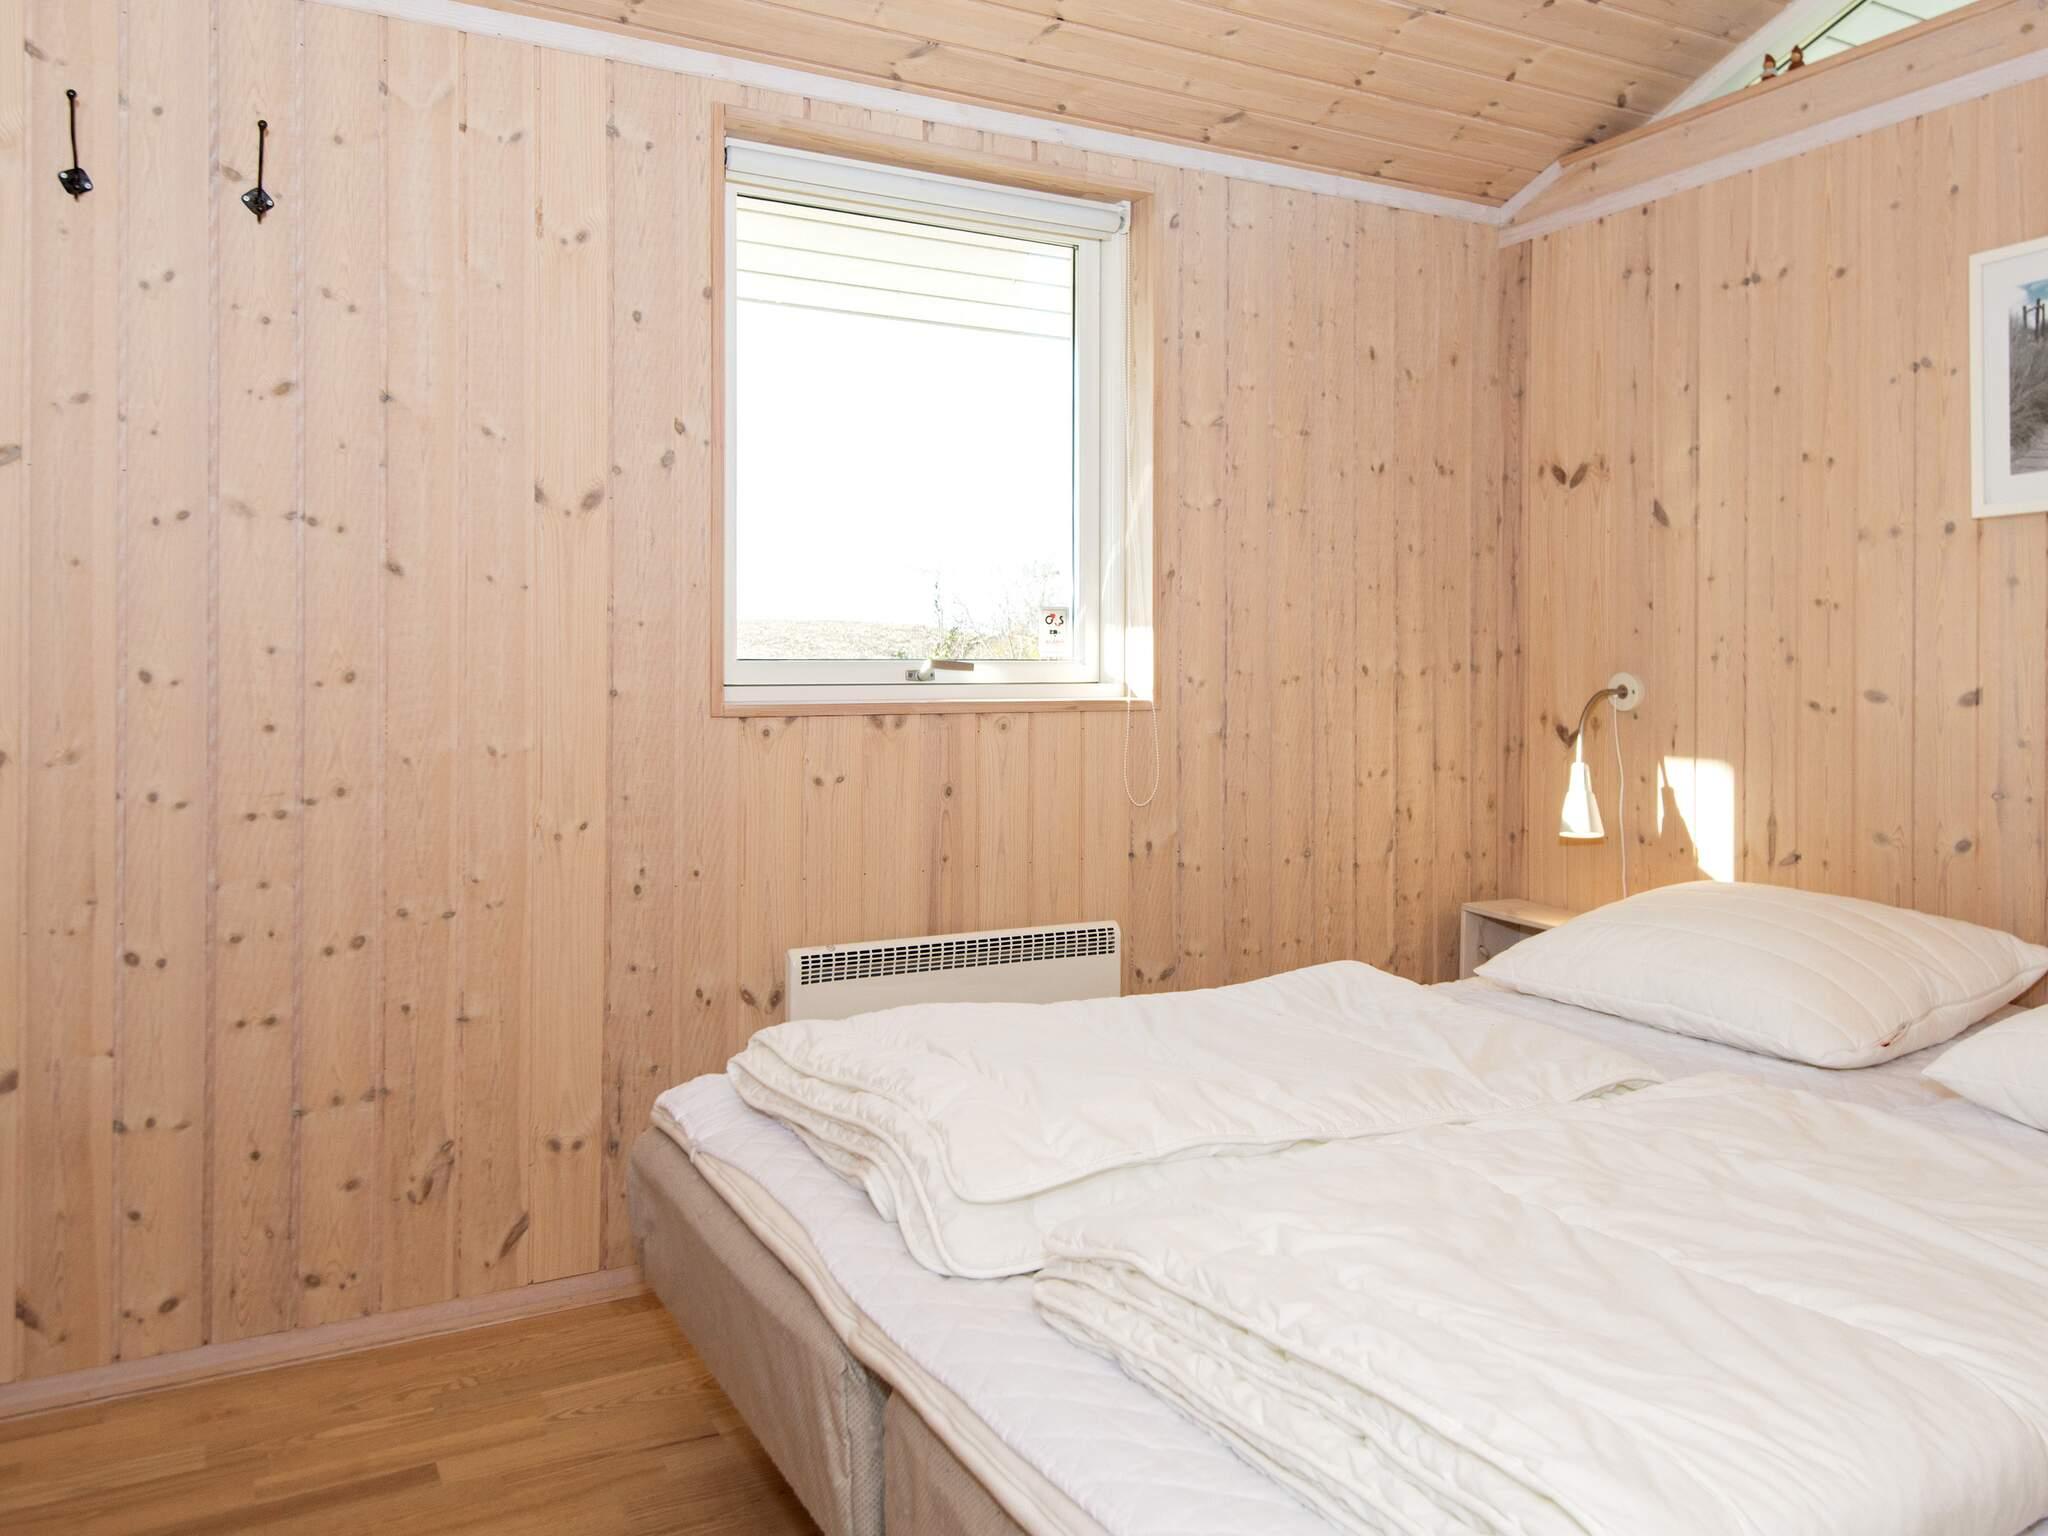 Maison de vacances Helgenæs (681779), Knebel, , Mer Baltique danoise, Danemark, image 9